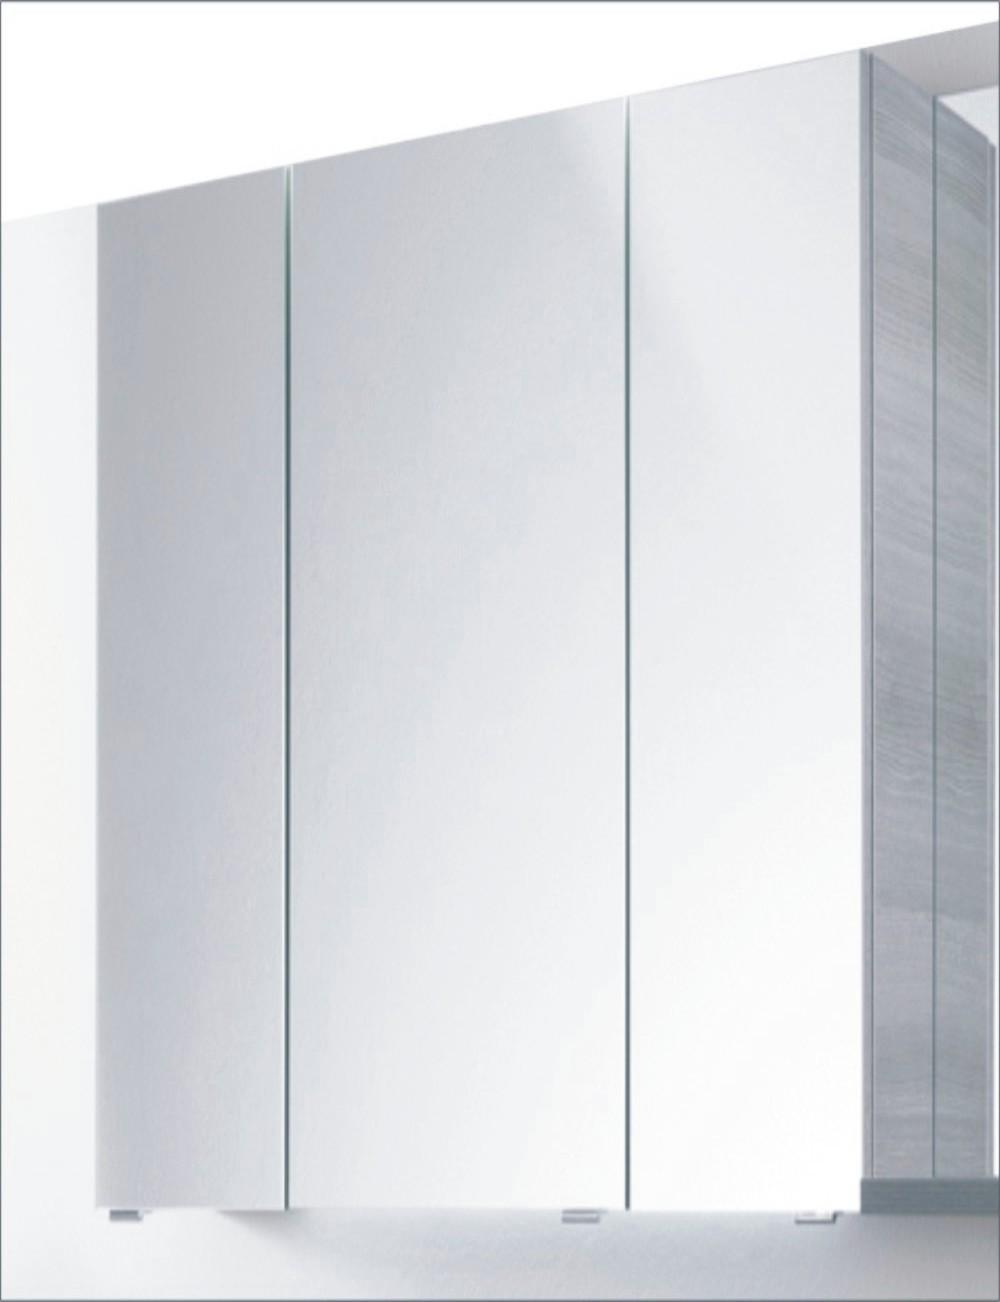 pelipal pcon spiegelschrank 80 cm arcom center. Black Bedroom Furniture Sets. Home Design Ideas